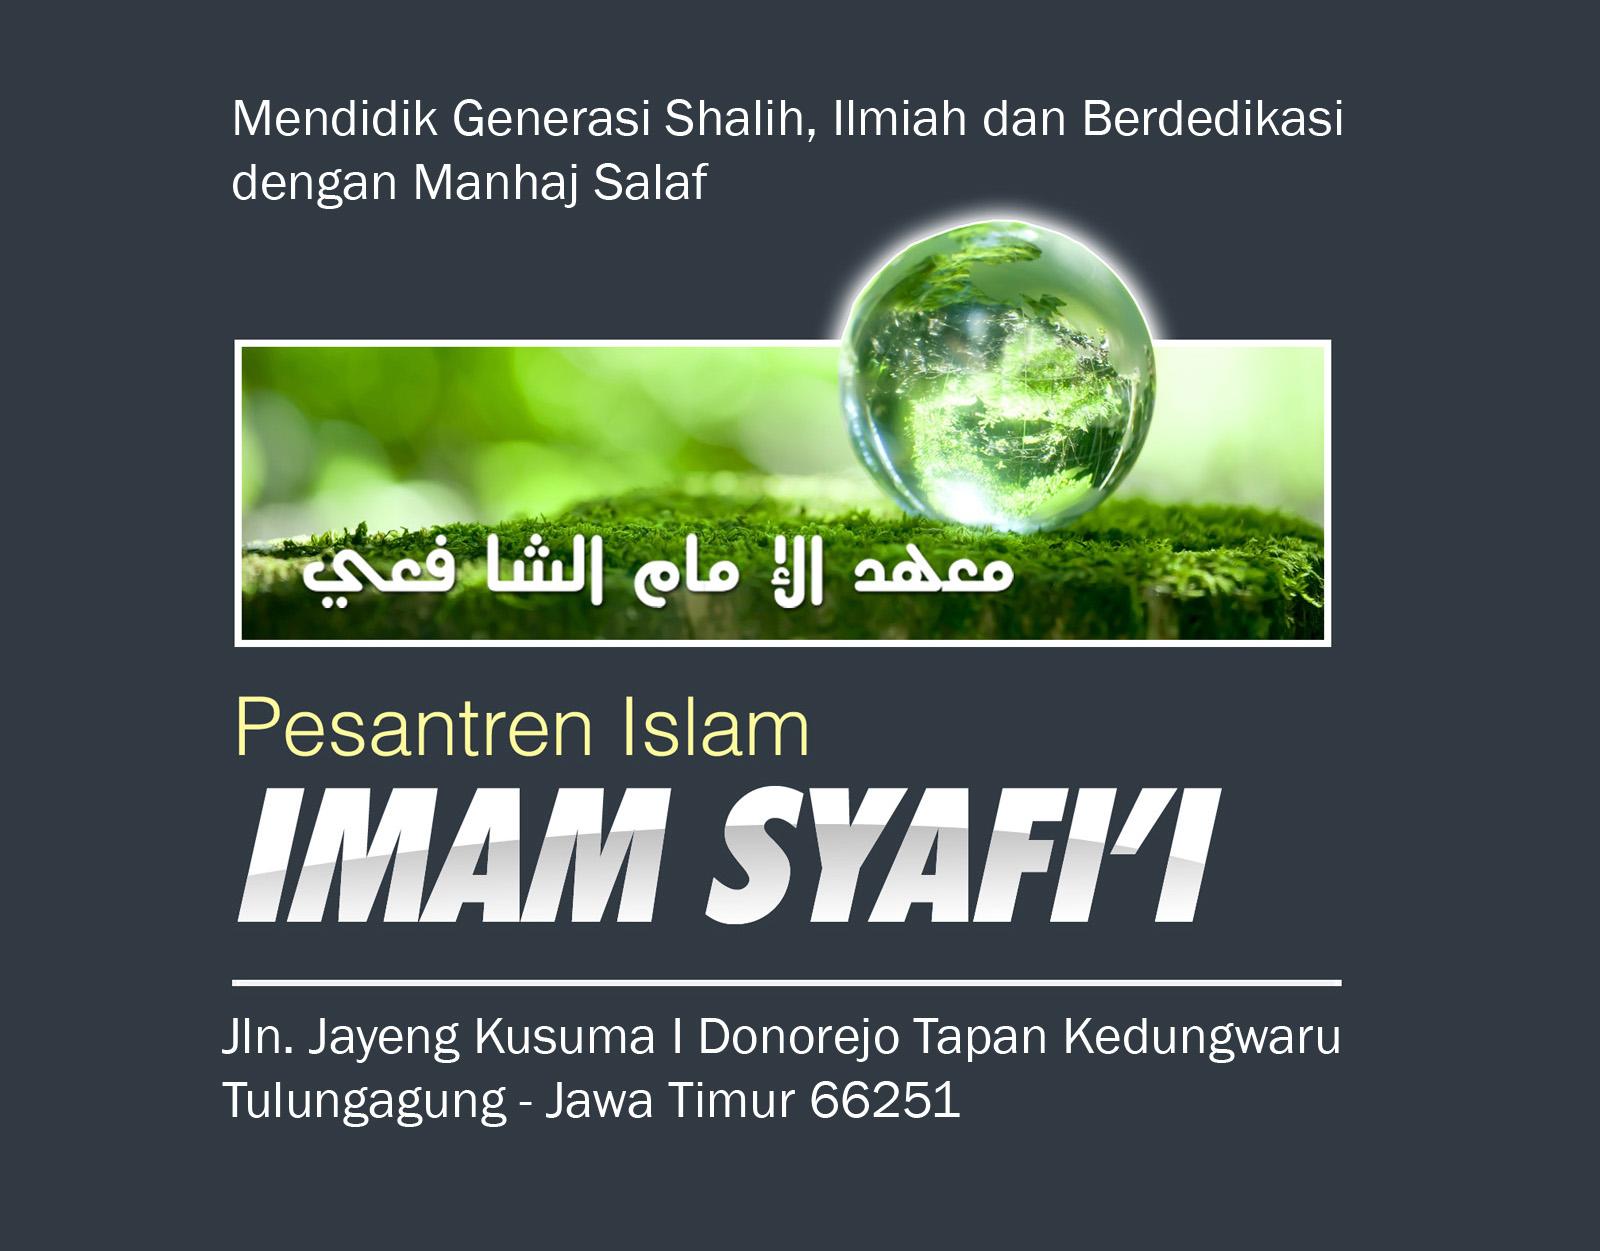 Ponpes Imam Syafi'i Tulungagung - Jawa Timur